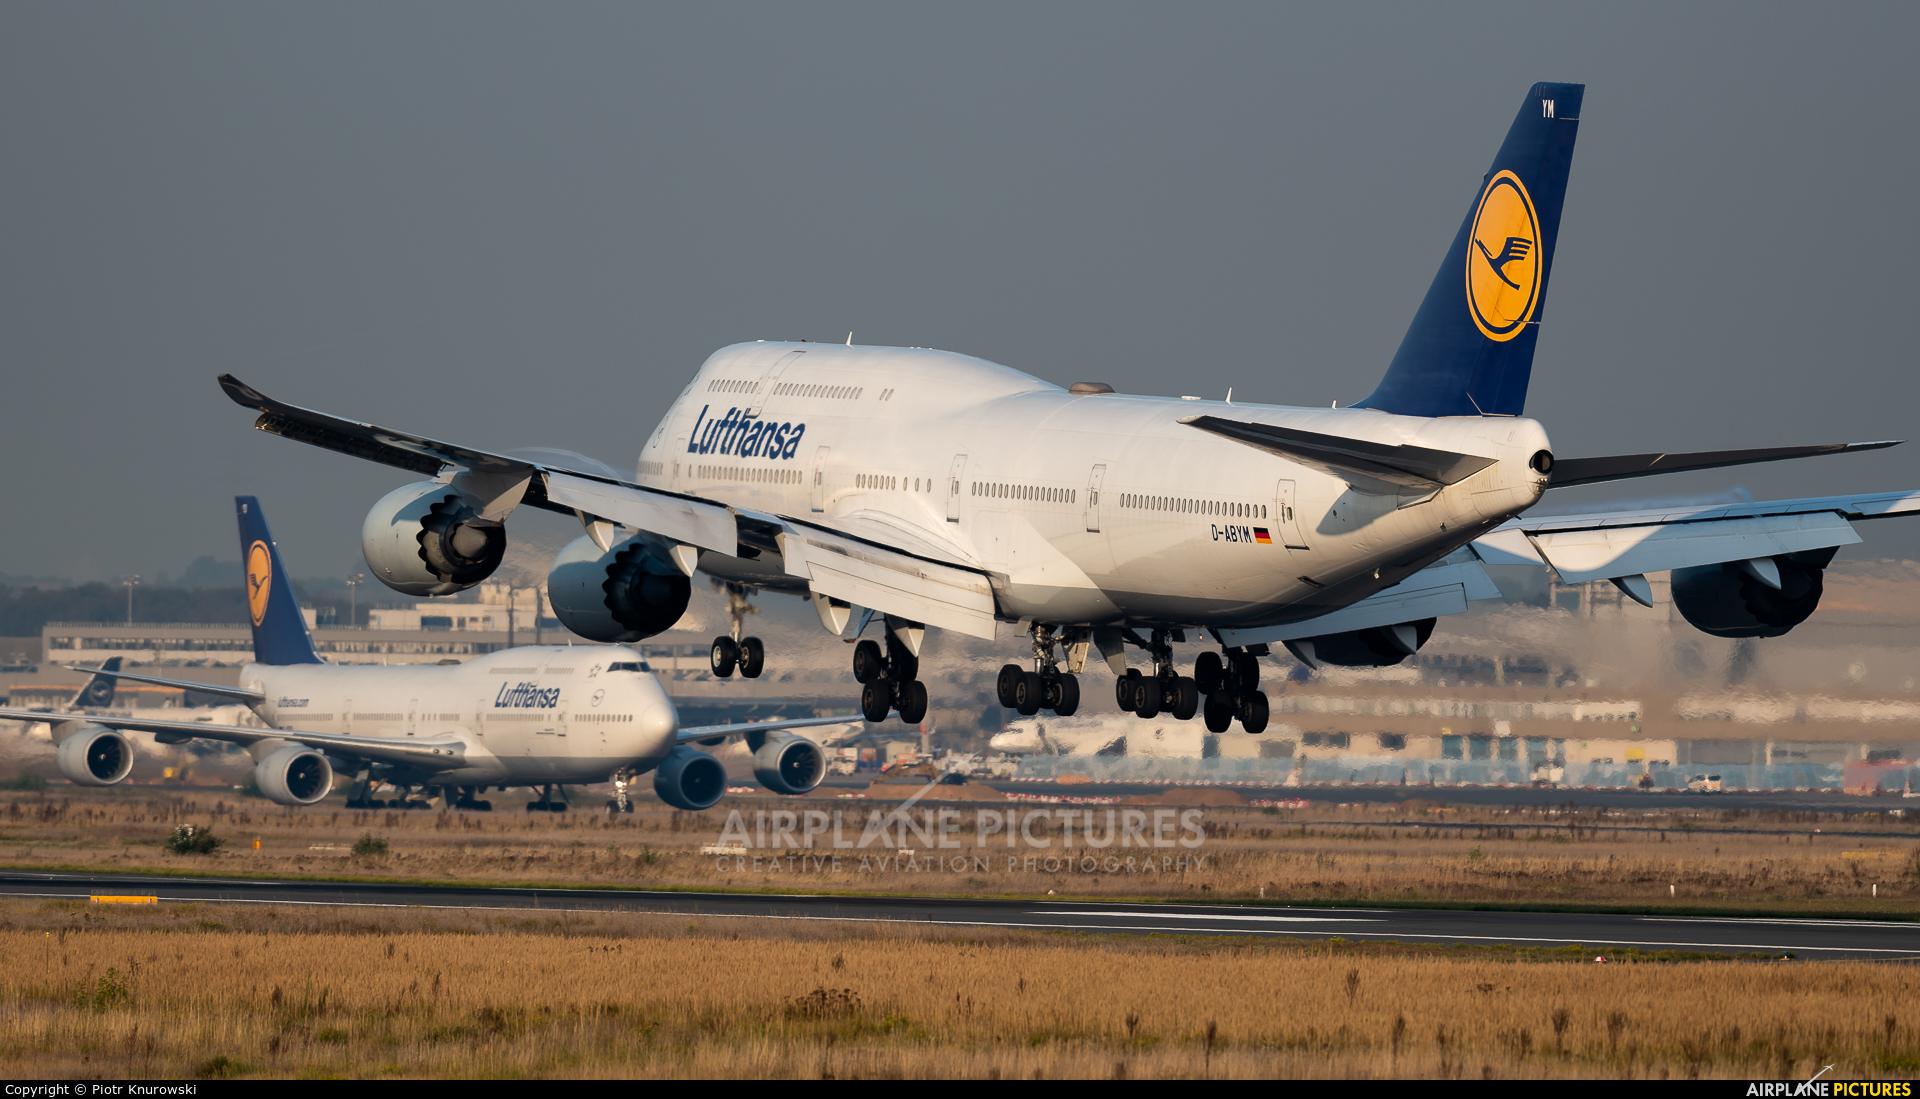 Lufthansa D-ABYM aircraft at Frankfurt